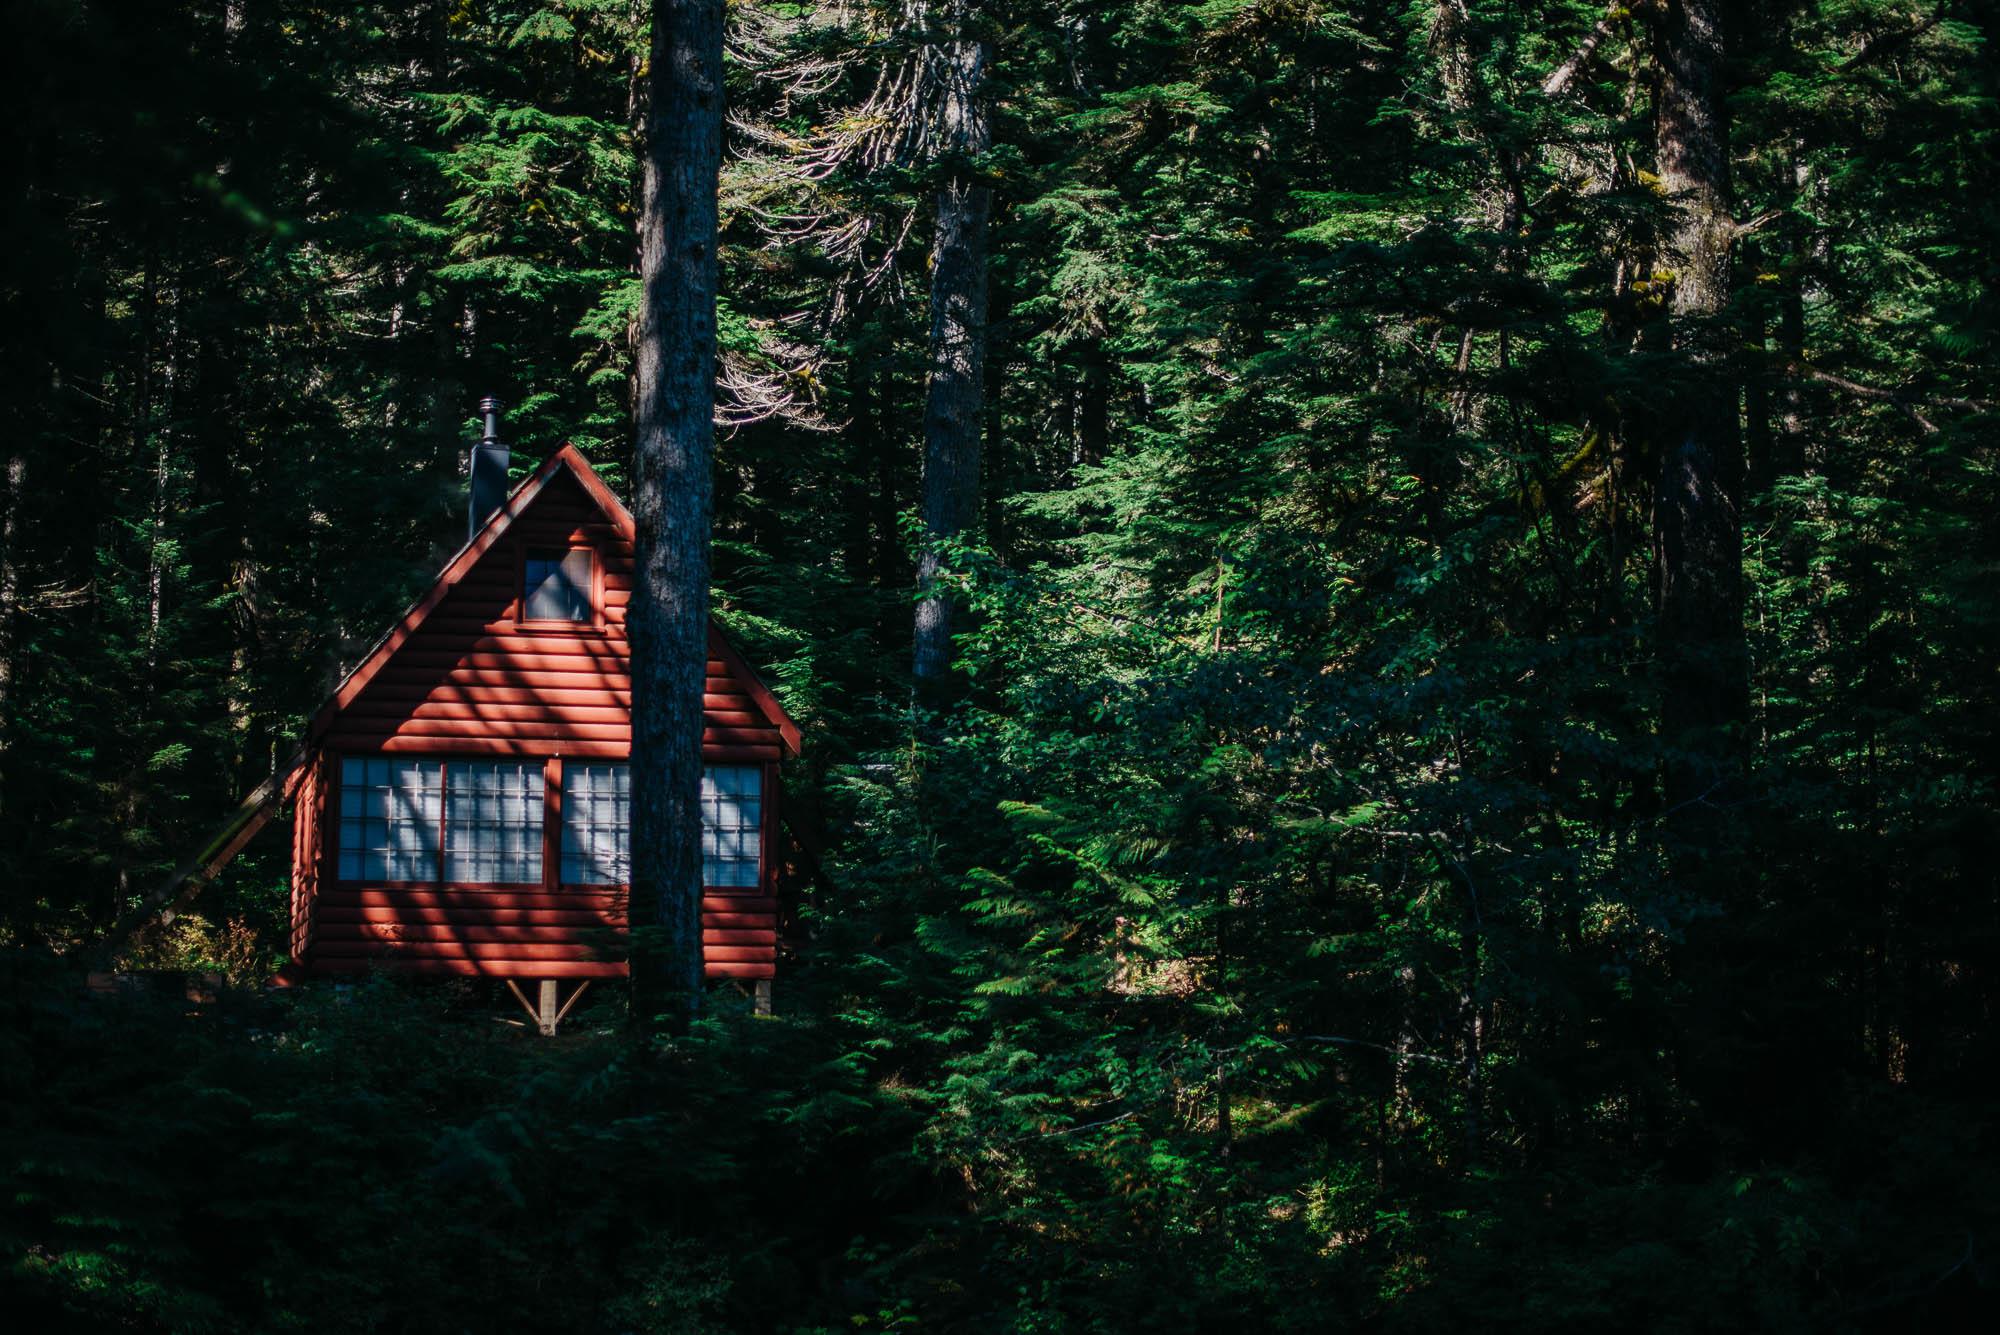 35elopement-photographer-colorado-Seattle-2016-September-304.jpg